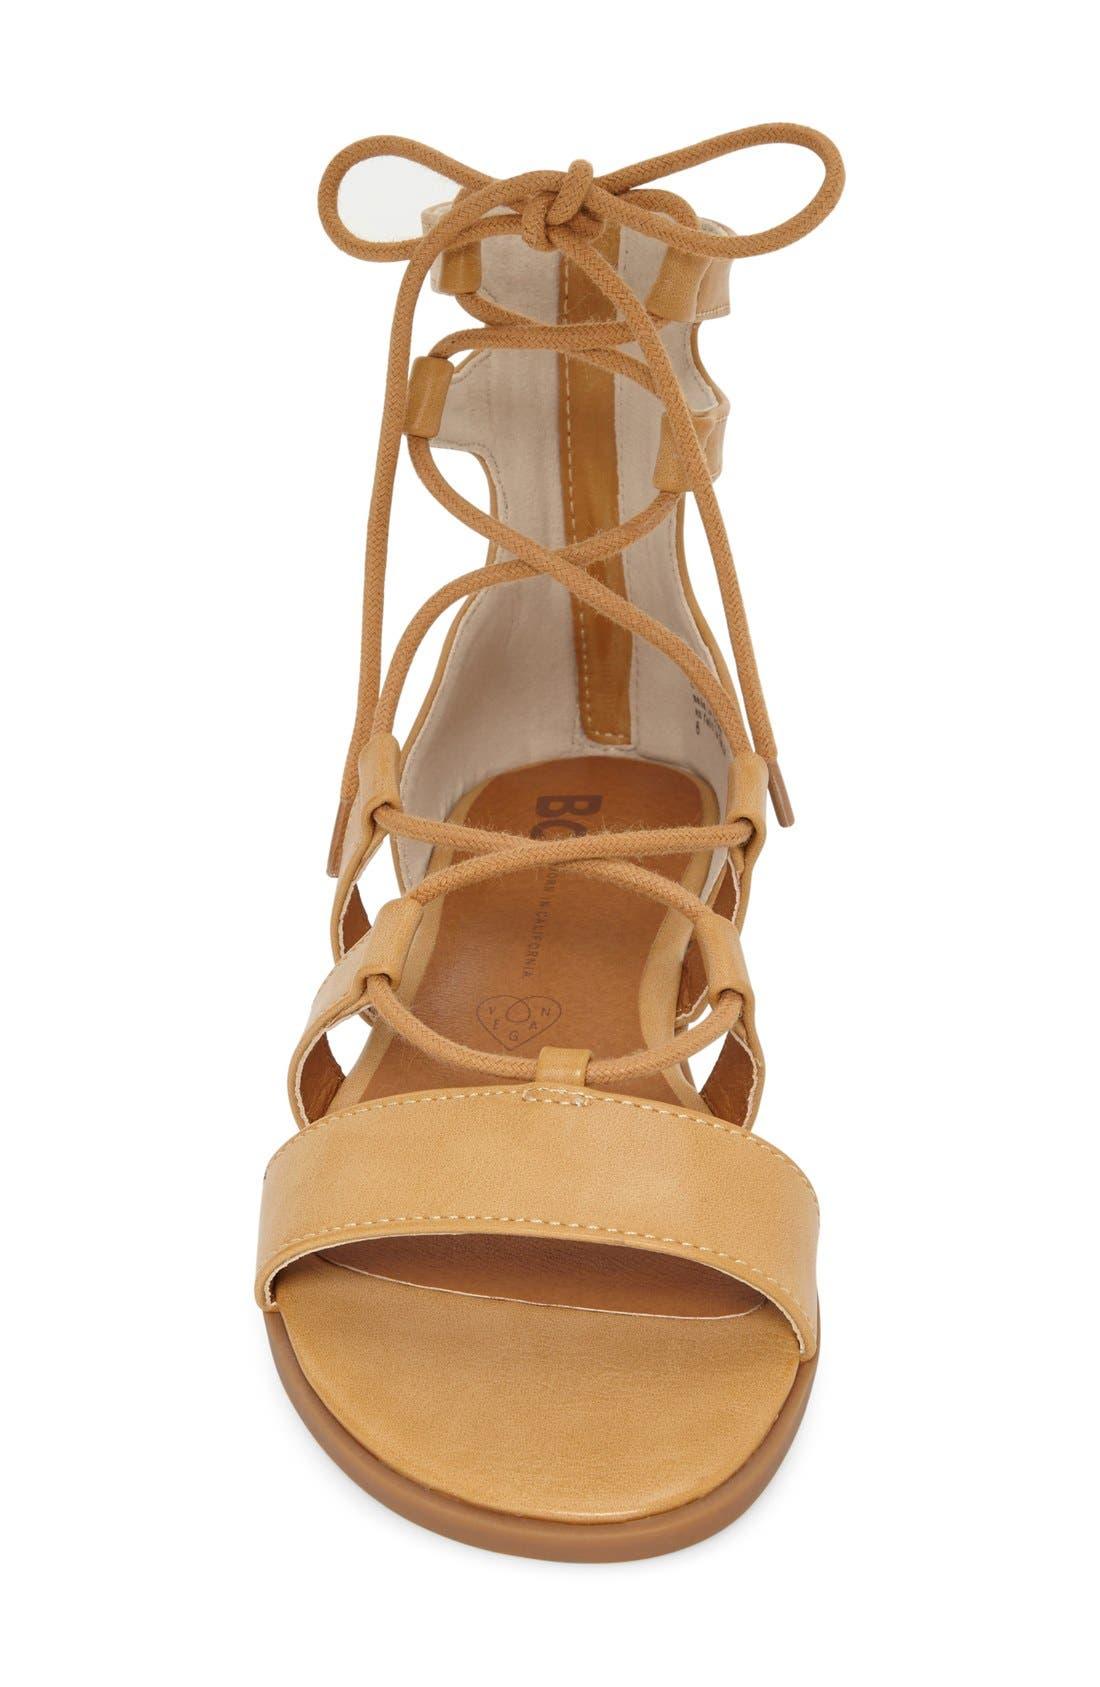 Alternate Image 3  - BC Footwear 'Pocket Size' Lace-Up Flat Sandal (Women)